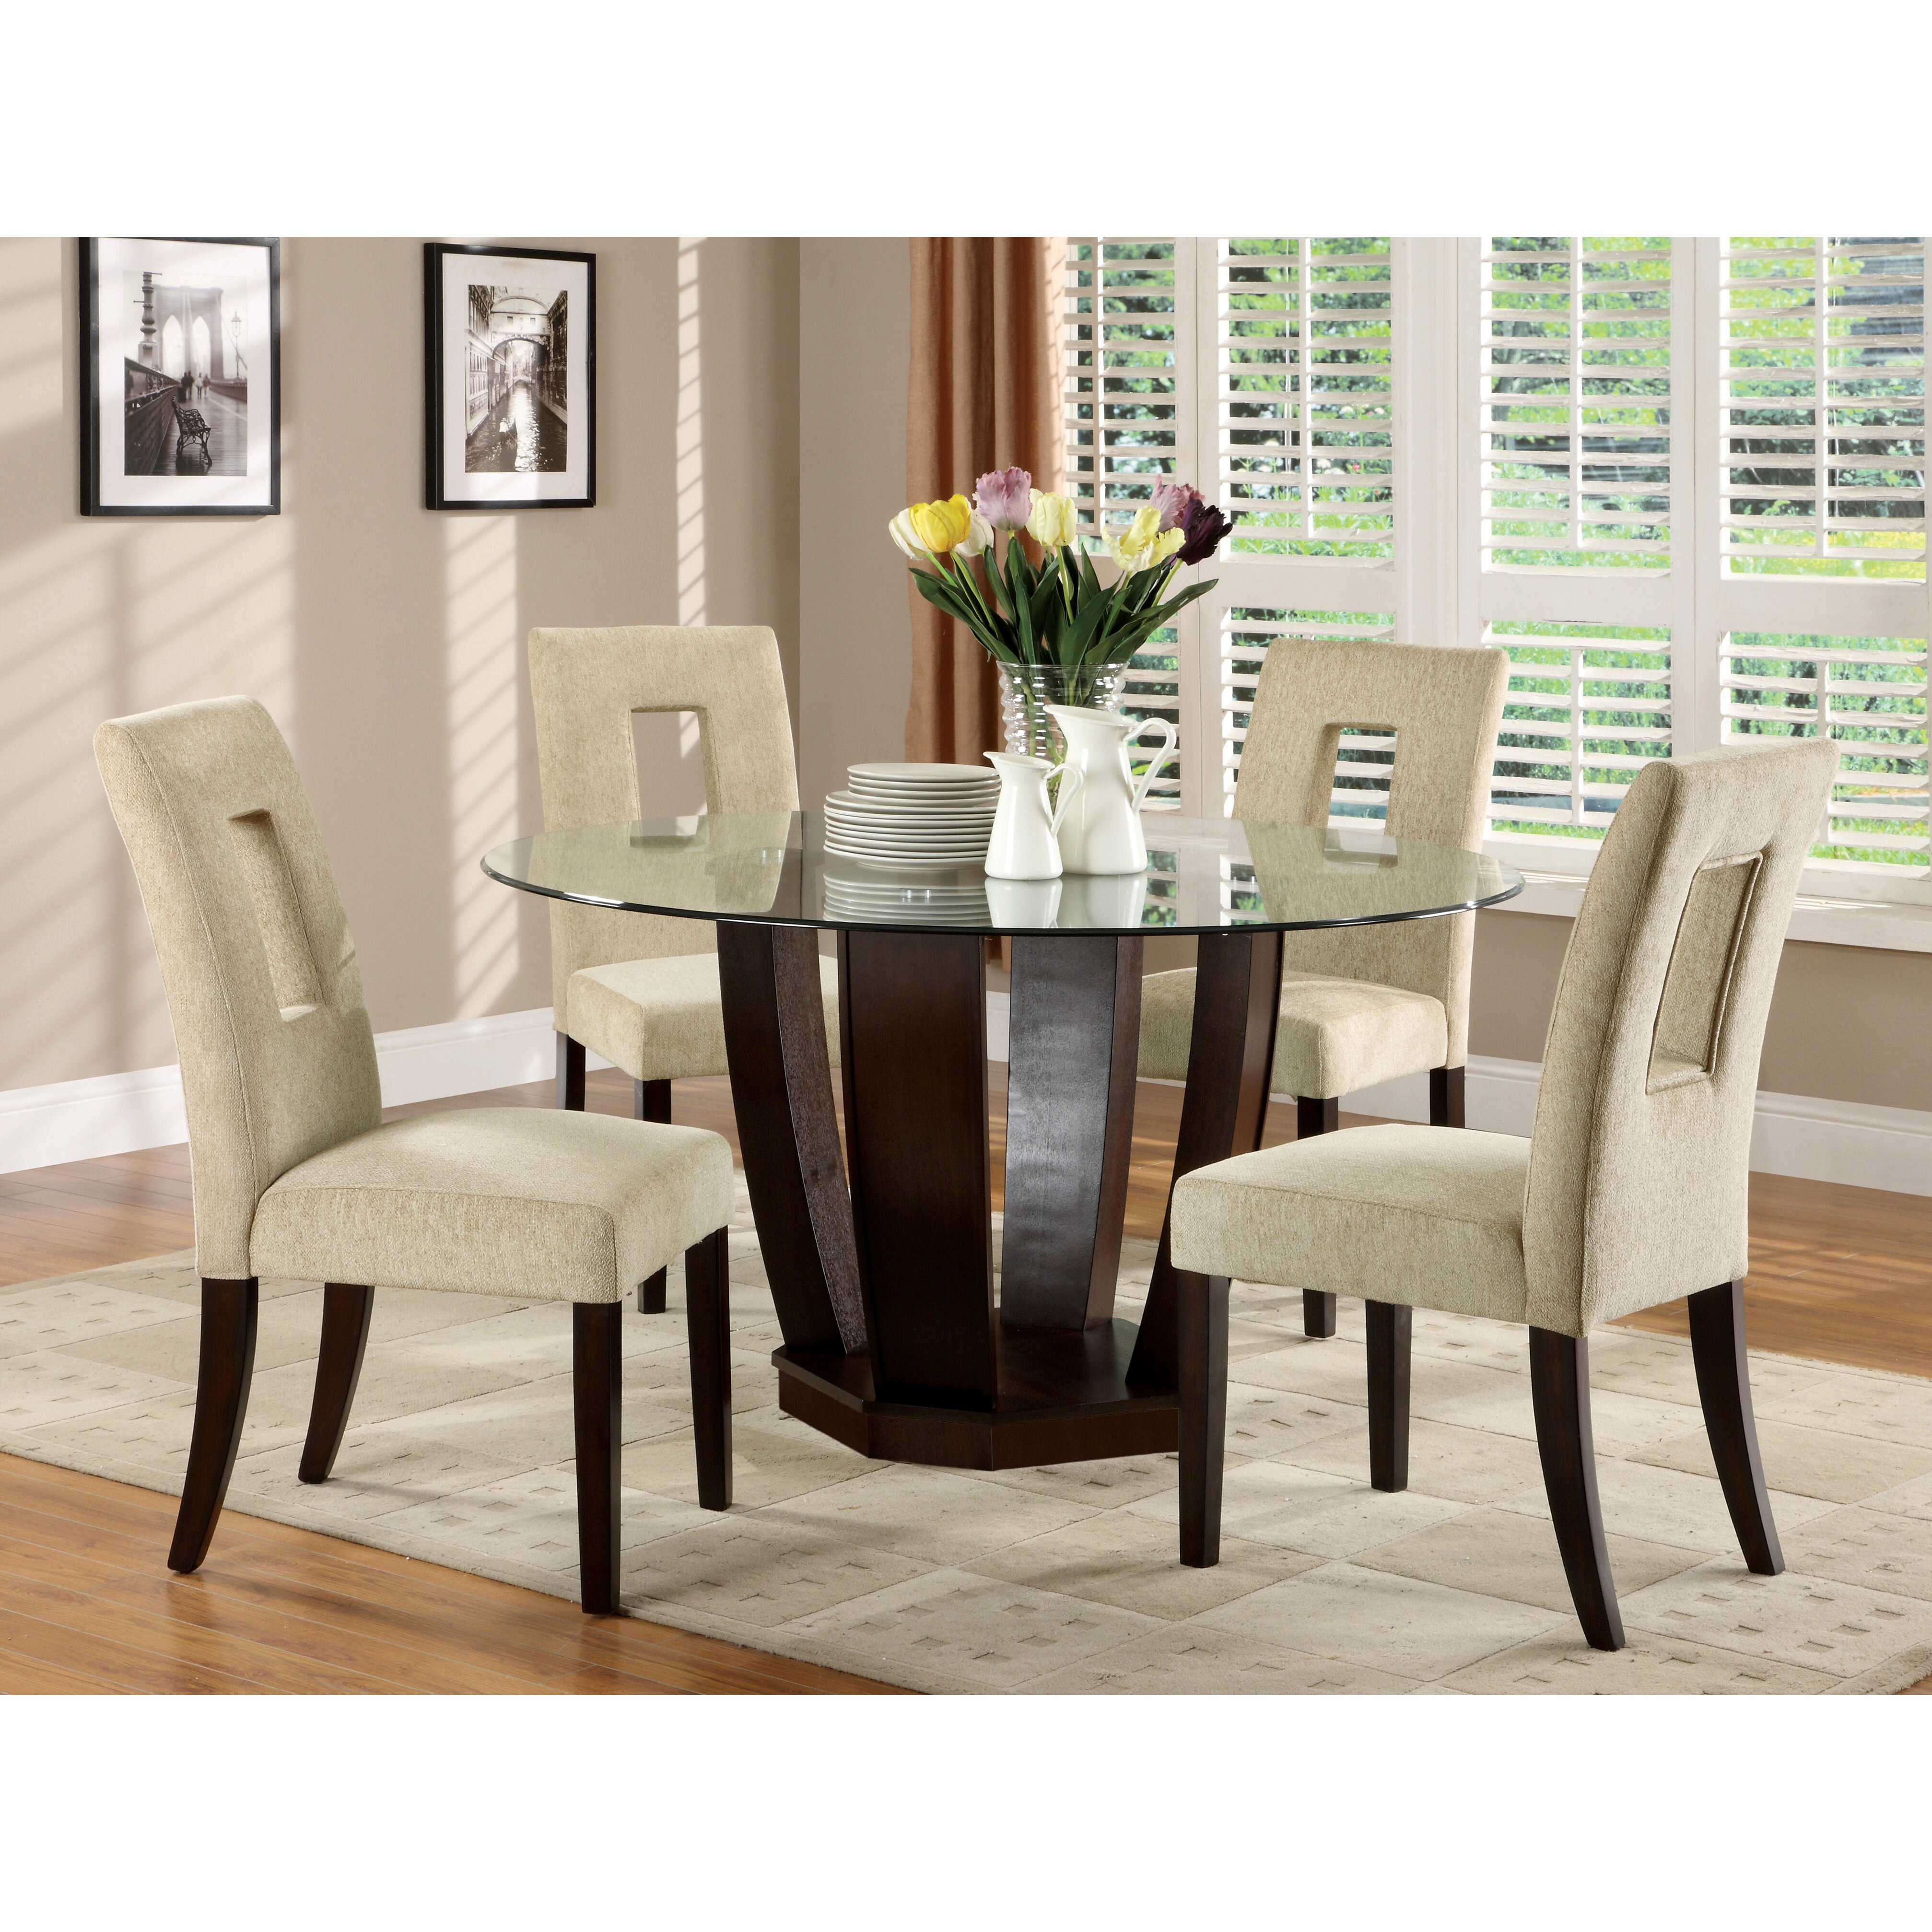 Hokku designs catina 5 piece dining set reviews wayfair for Hokku designs dining room furniture